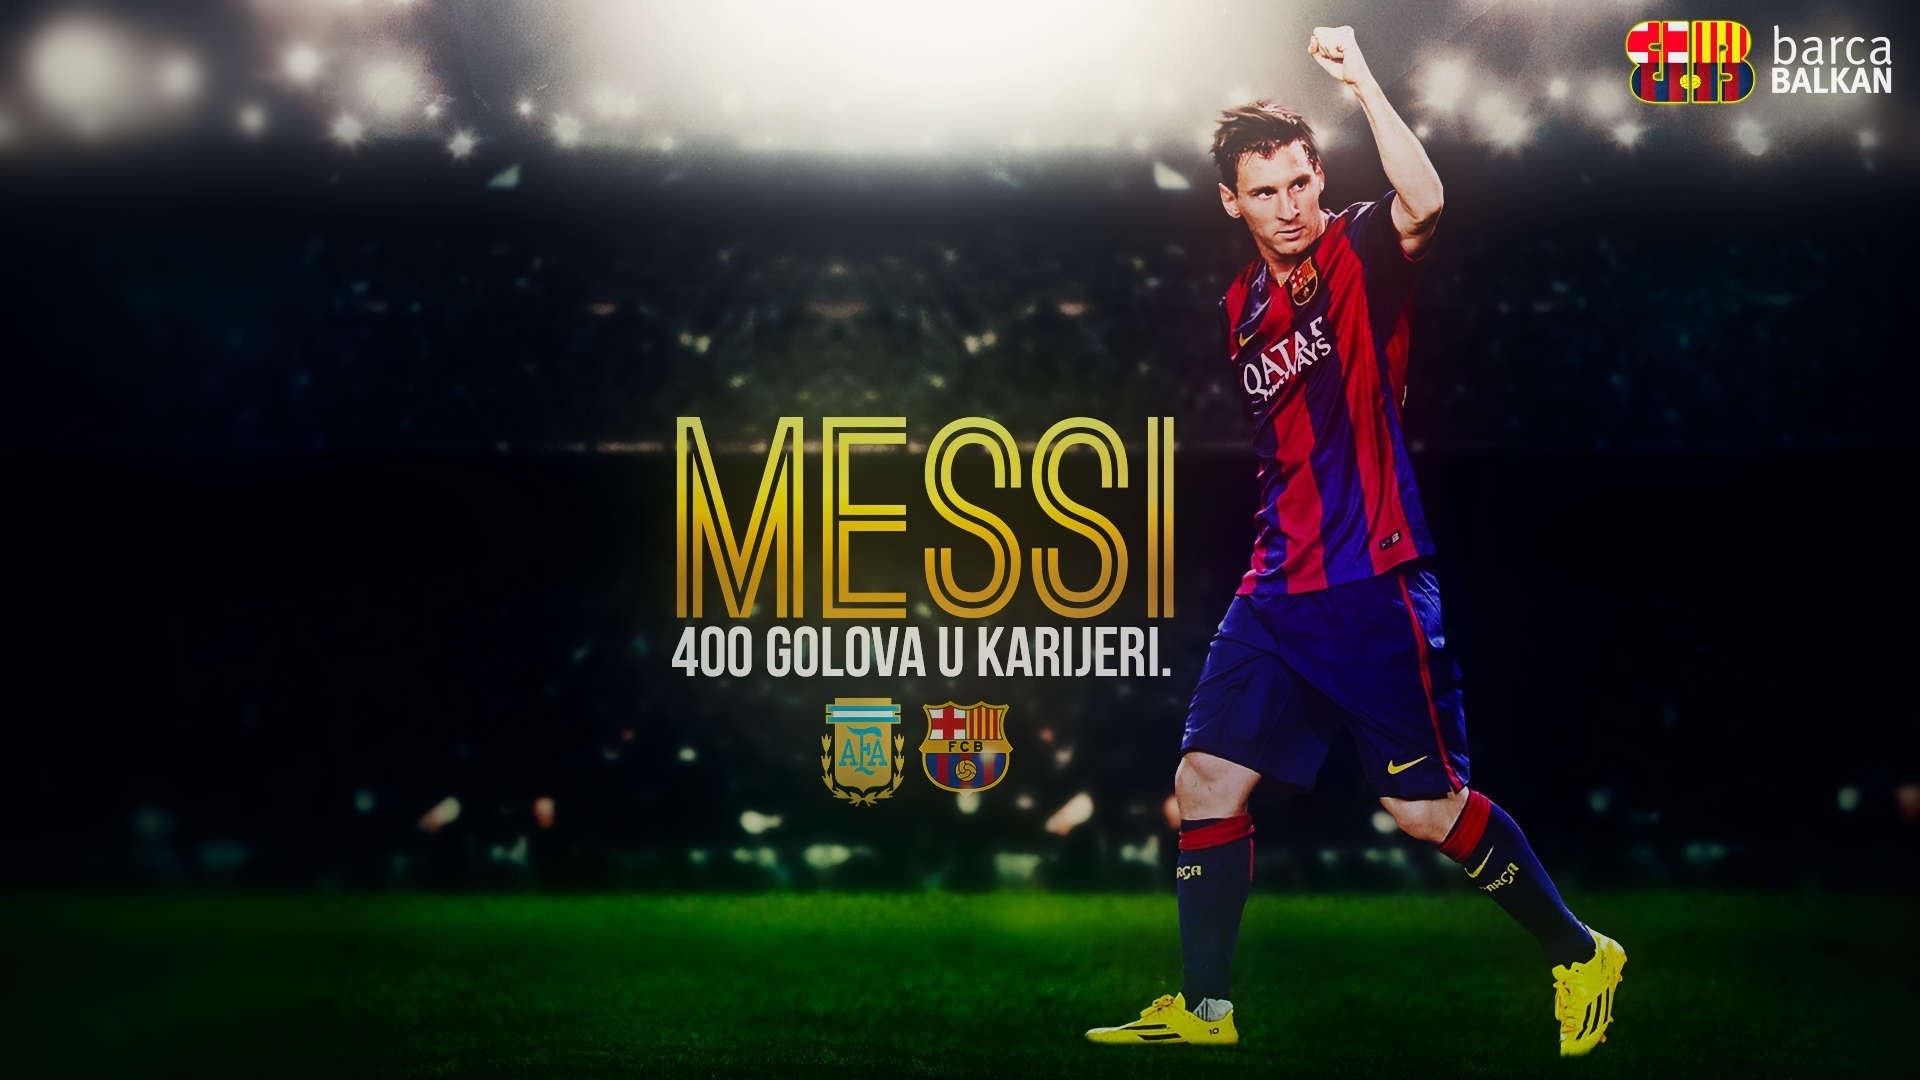 Best Lionel Messi Live Wallpaper Free Download – FC Barcelona Wallpaper HD  2017 DKC0